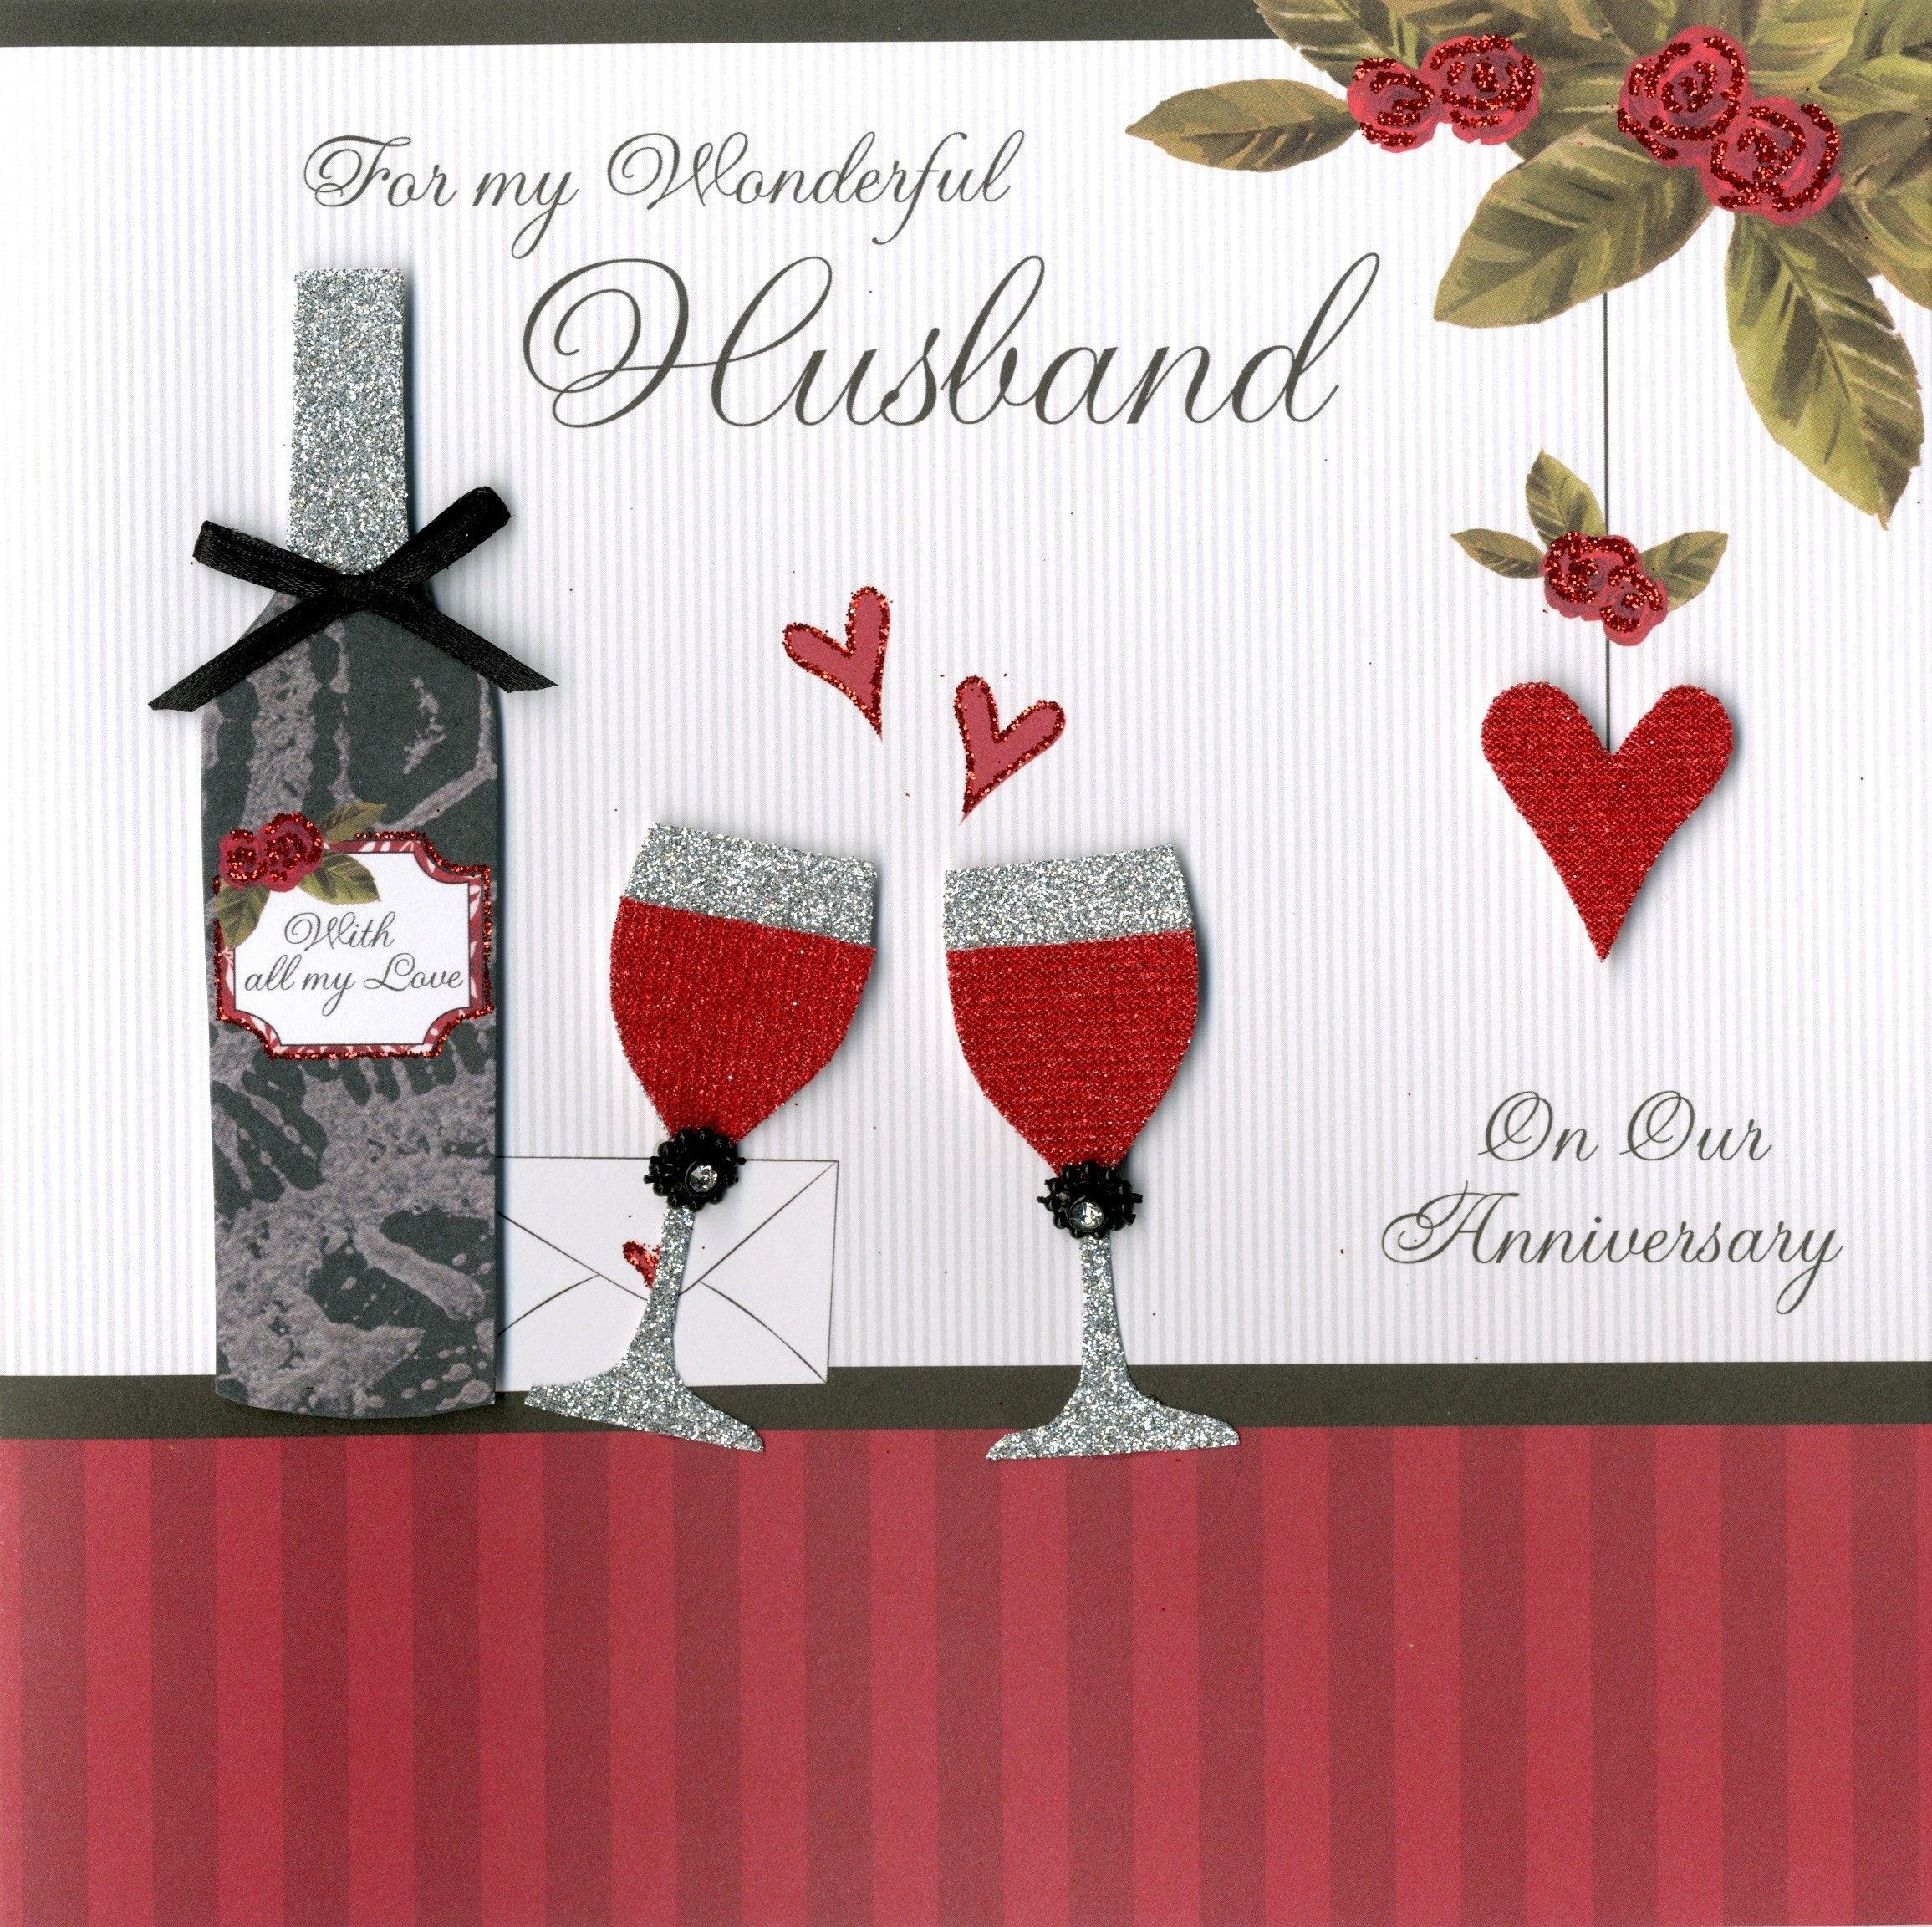 Anniversary Cards Handmade Cards Handmade Valentine Cards Handmade